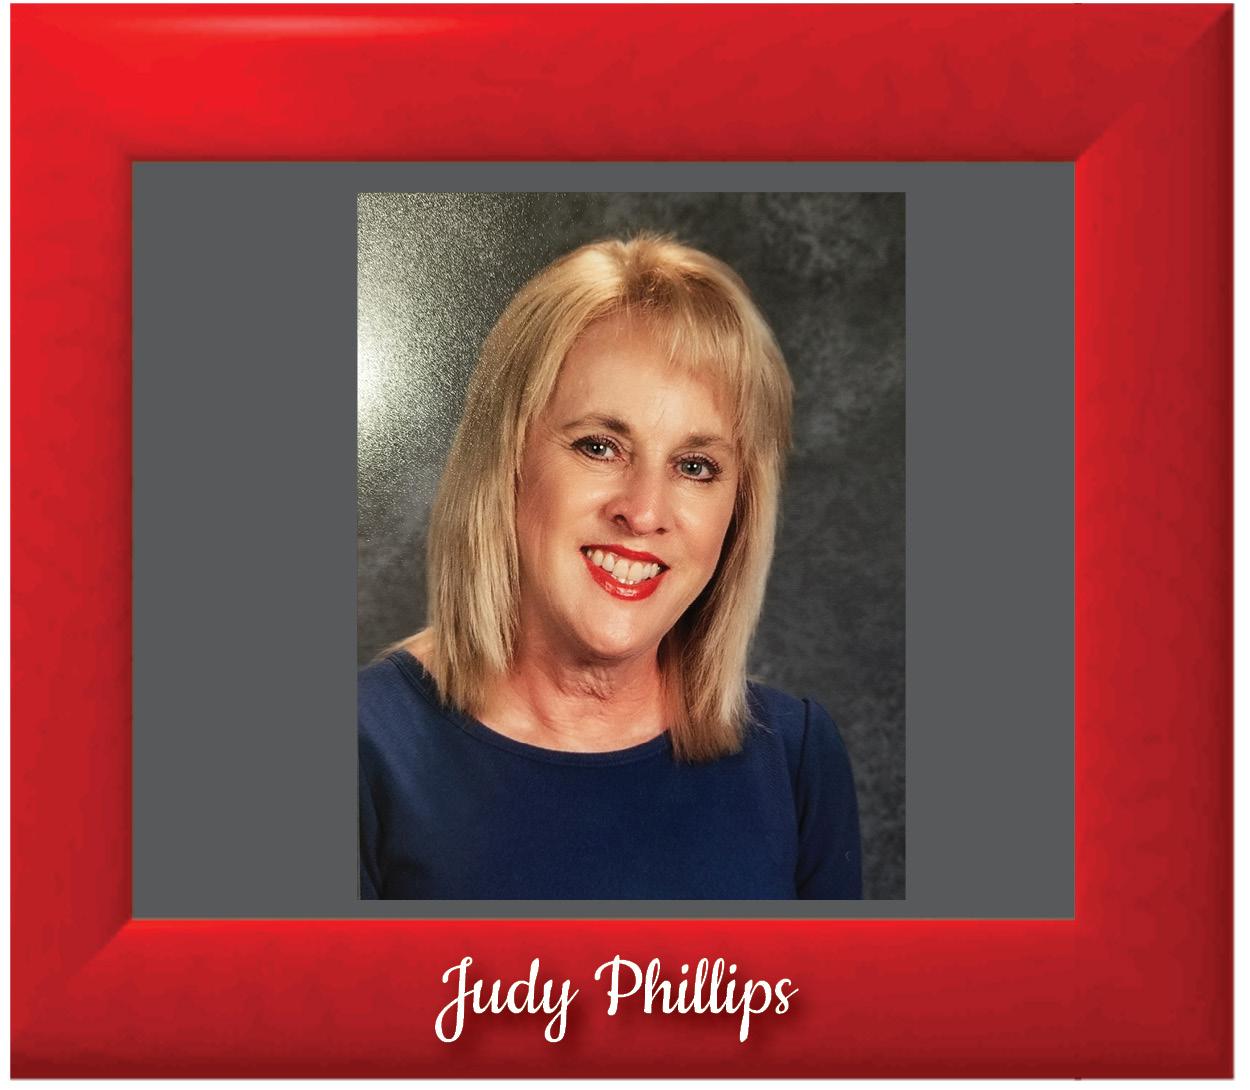 Judy Phillips